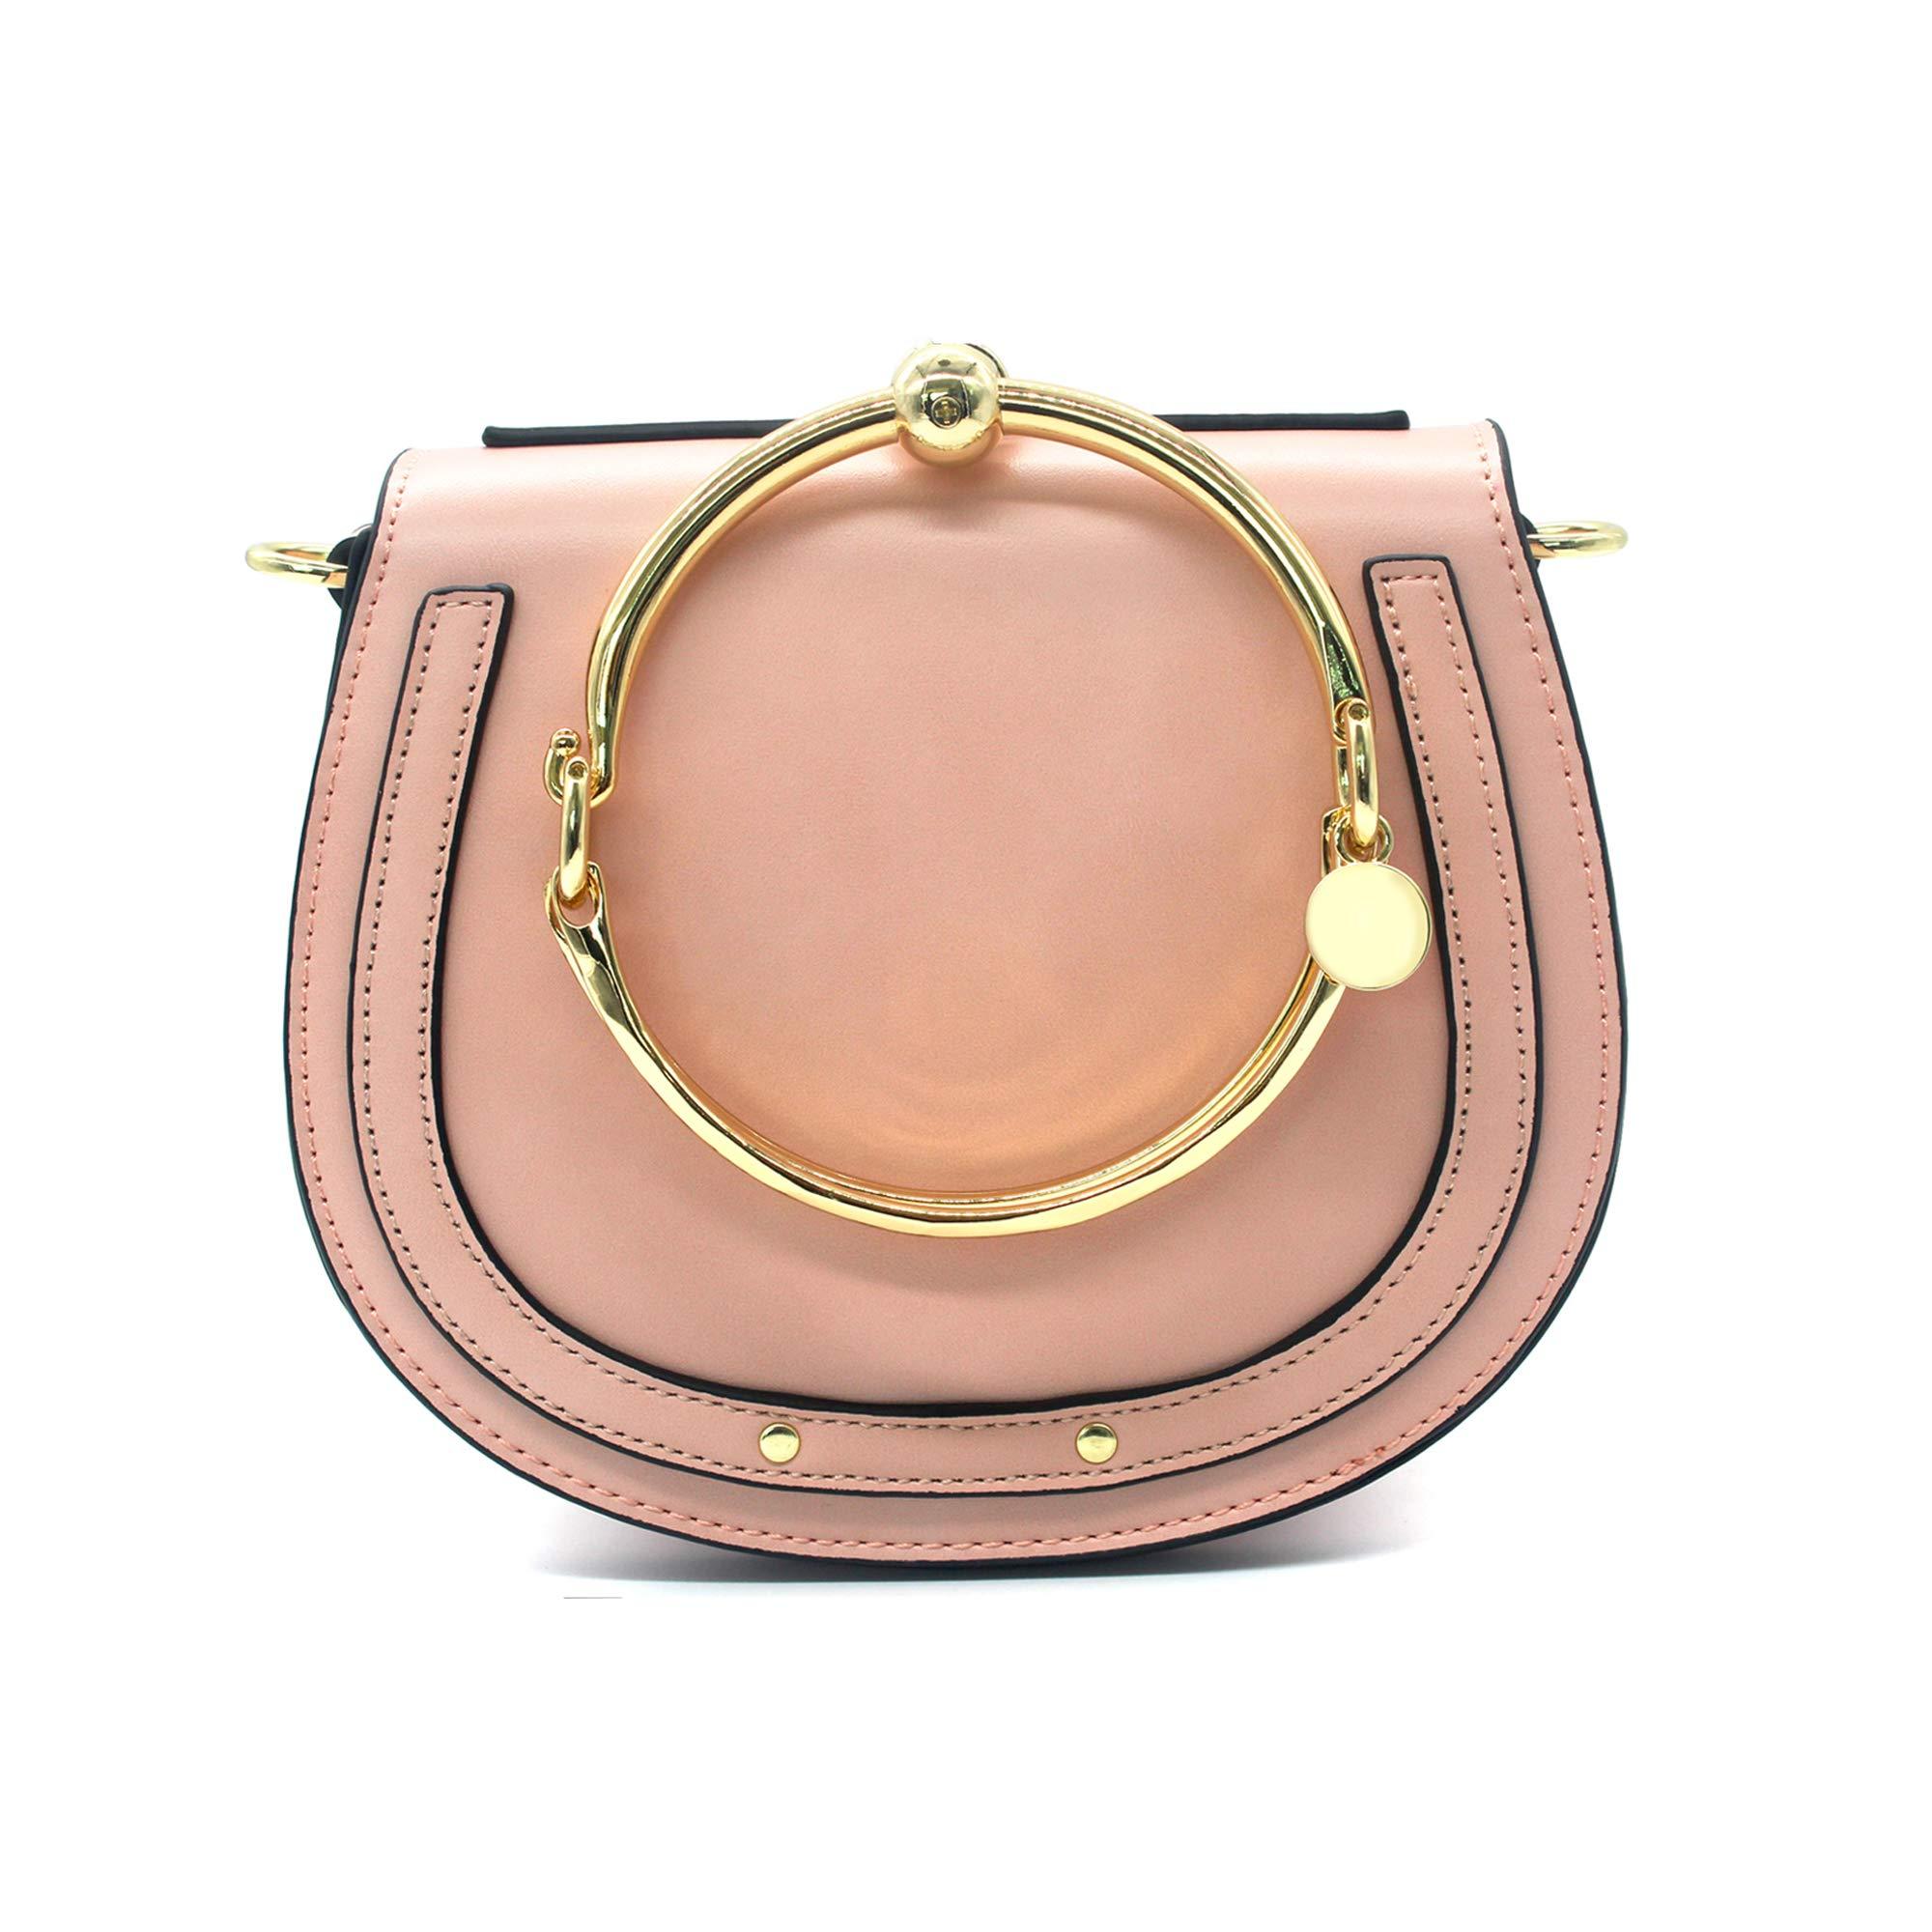 Yoome Elegant Rivets Punk Style Circular Ring Handle Handbags Messenger Crossbody Bags For Girls - Pink